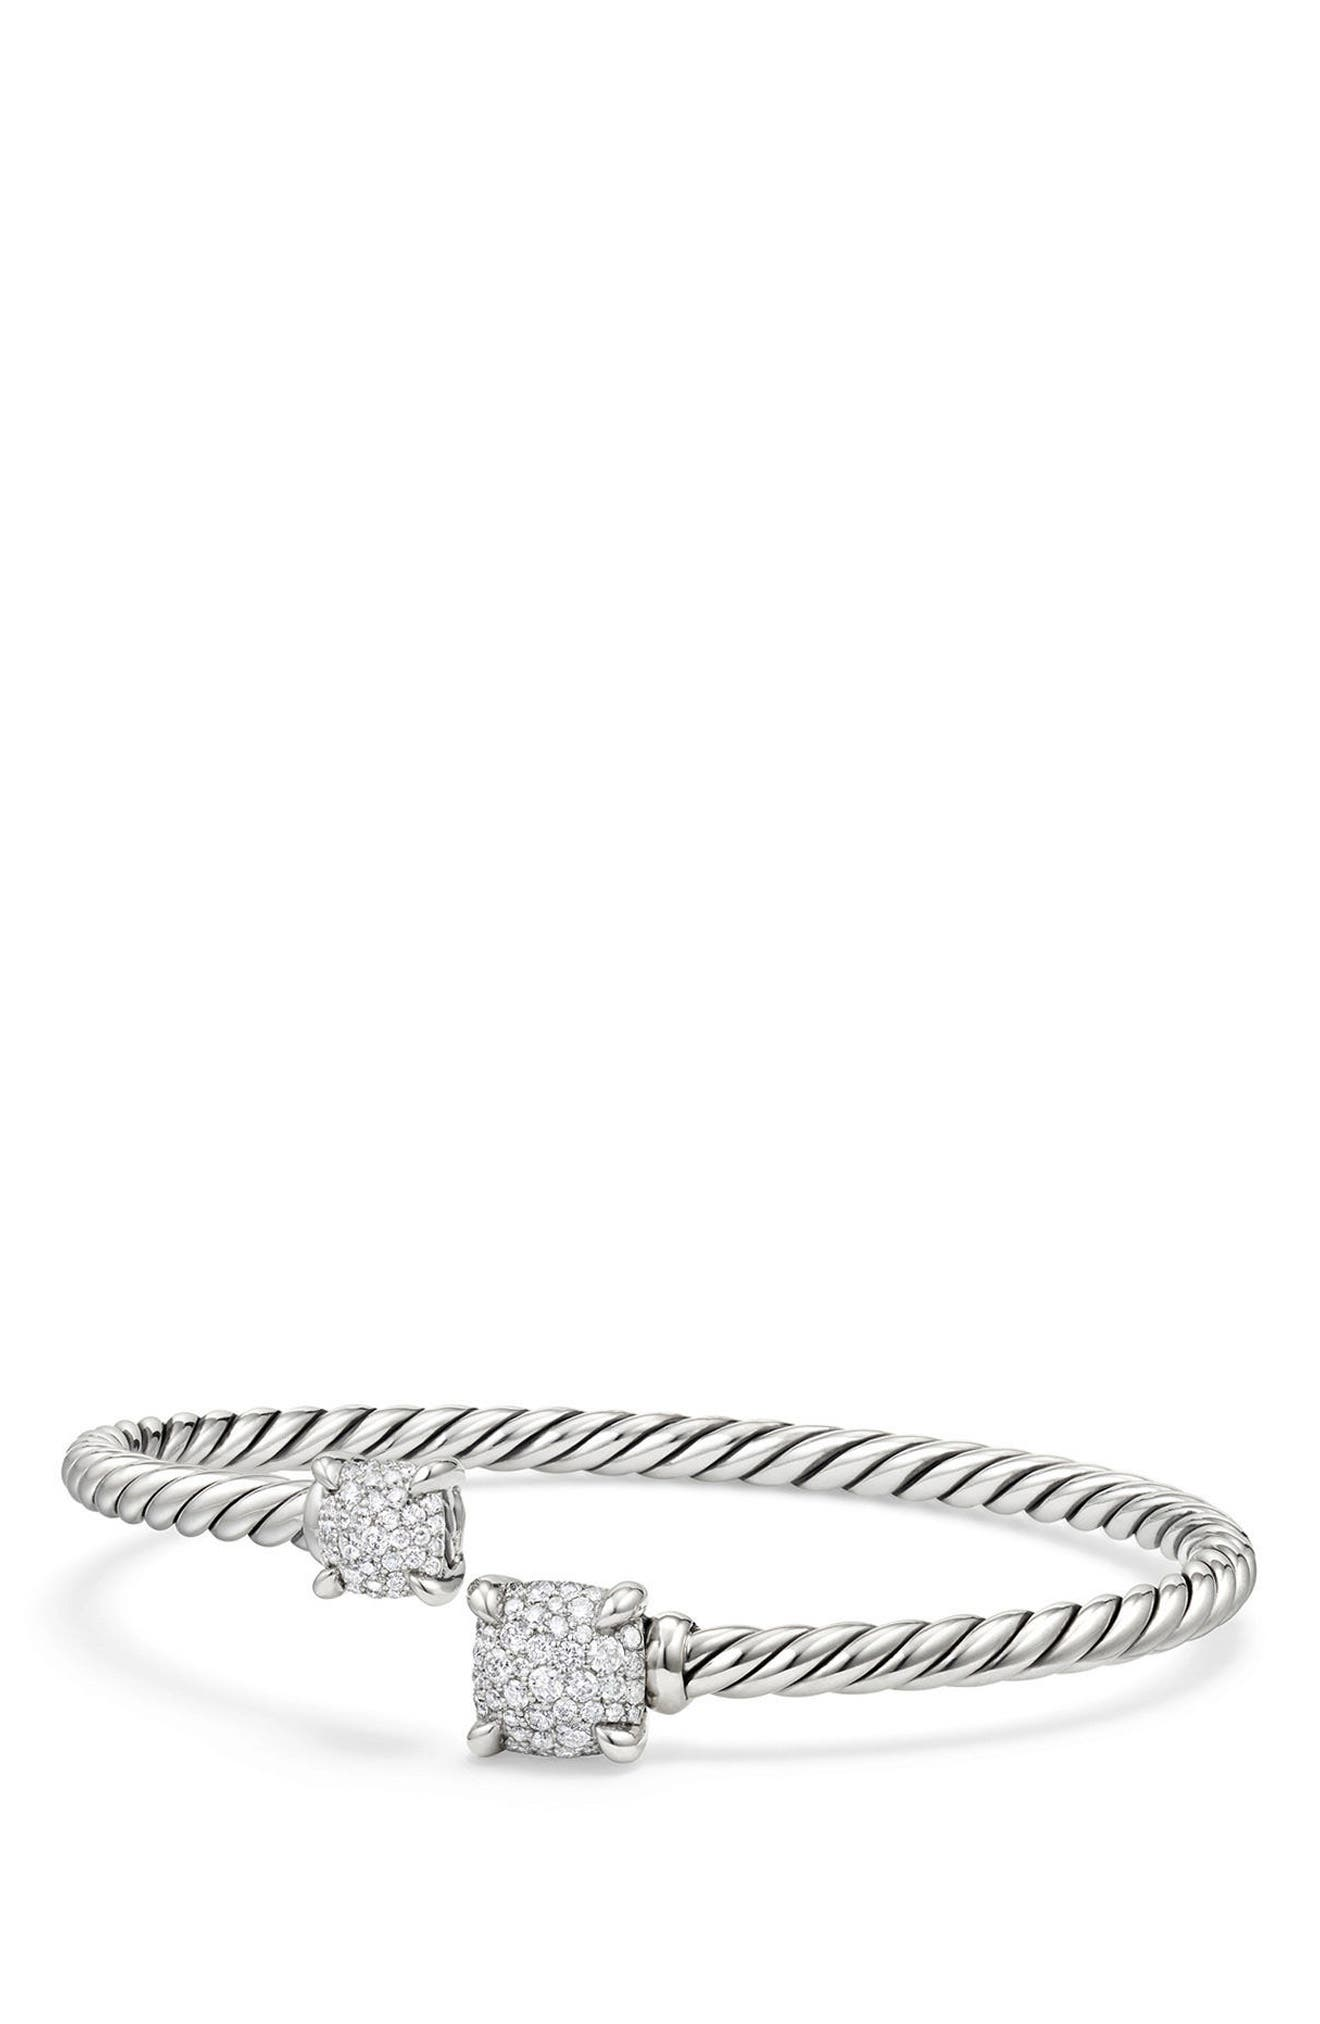 David Yurman Chatelaine Bypass Bracelet with Diamonds